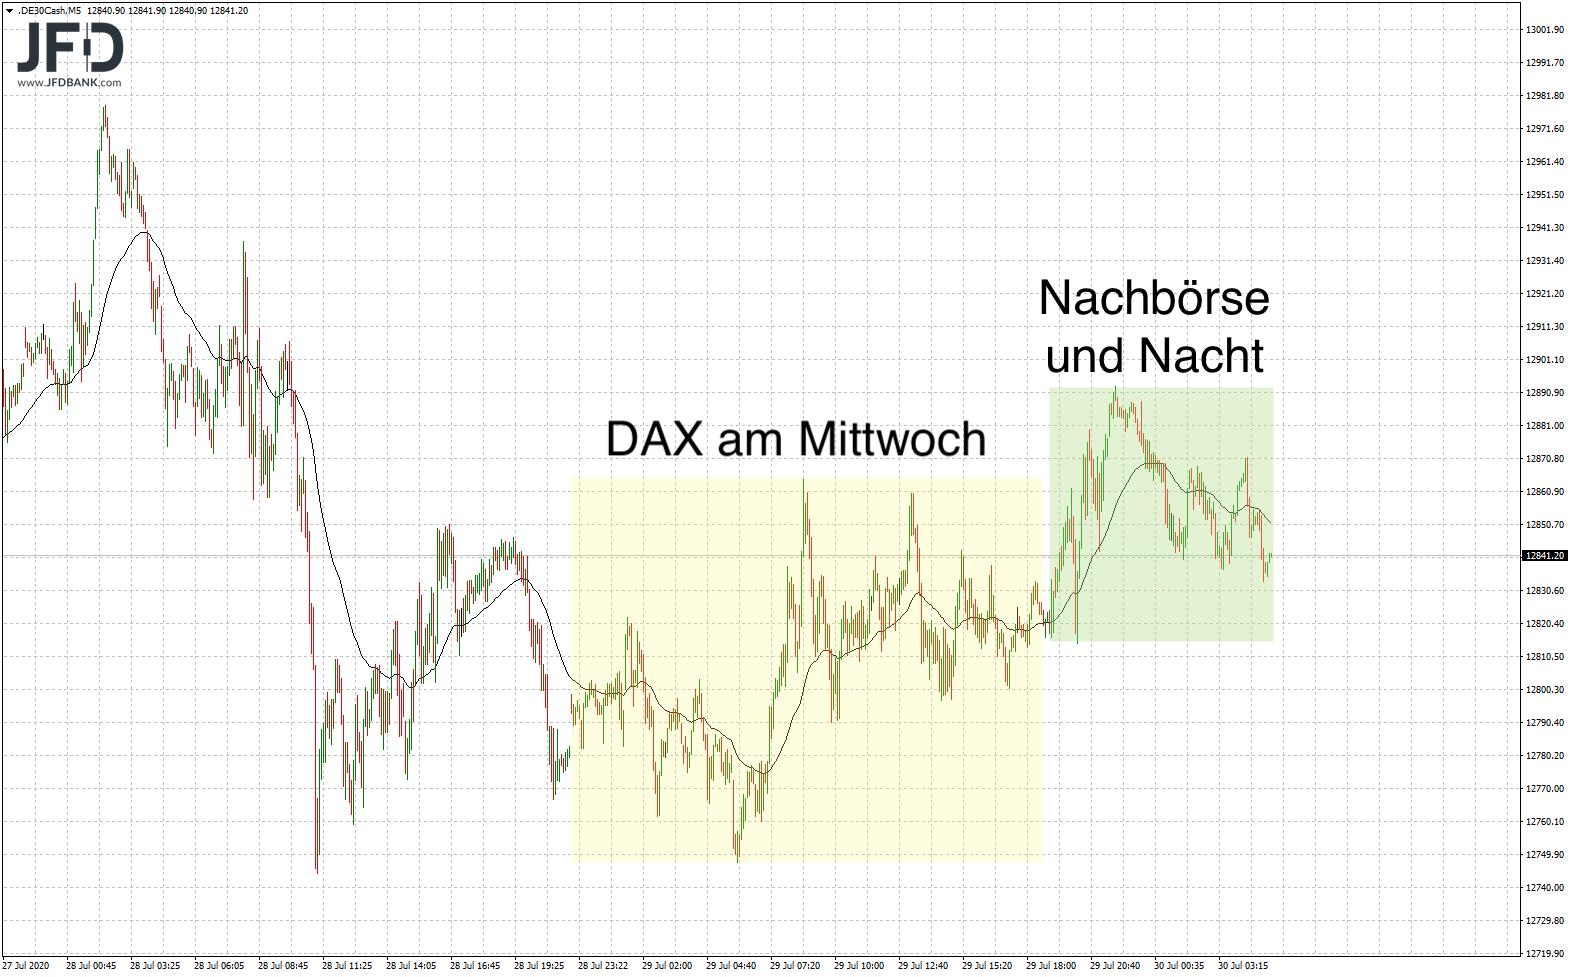 DAX Nachbörse